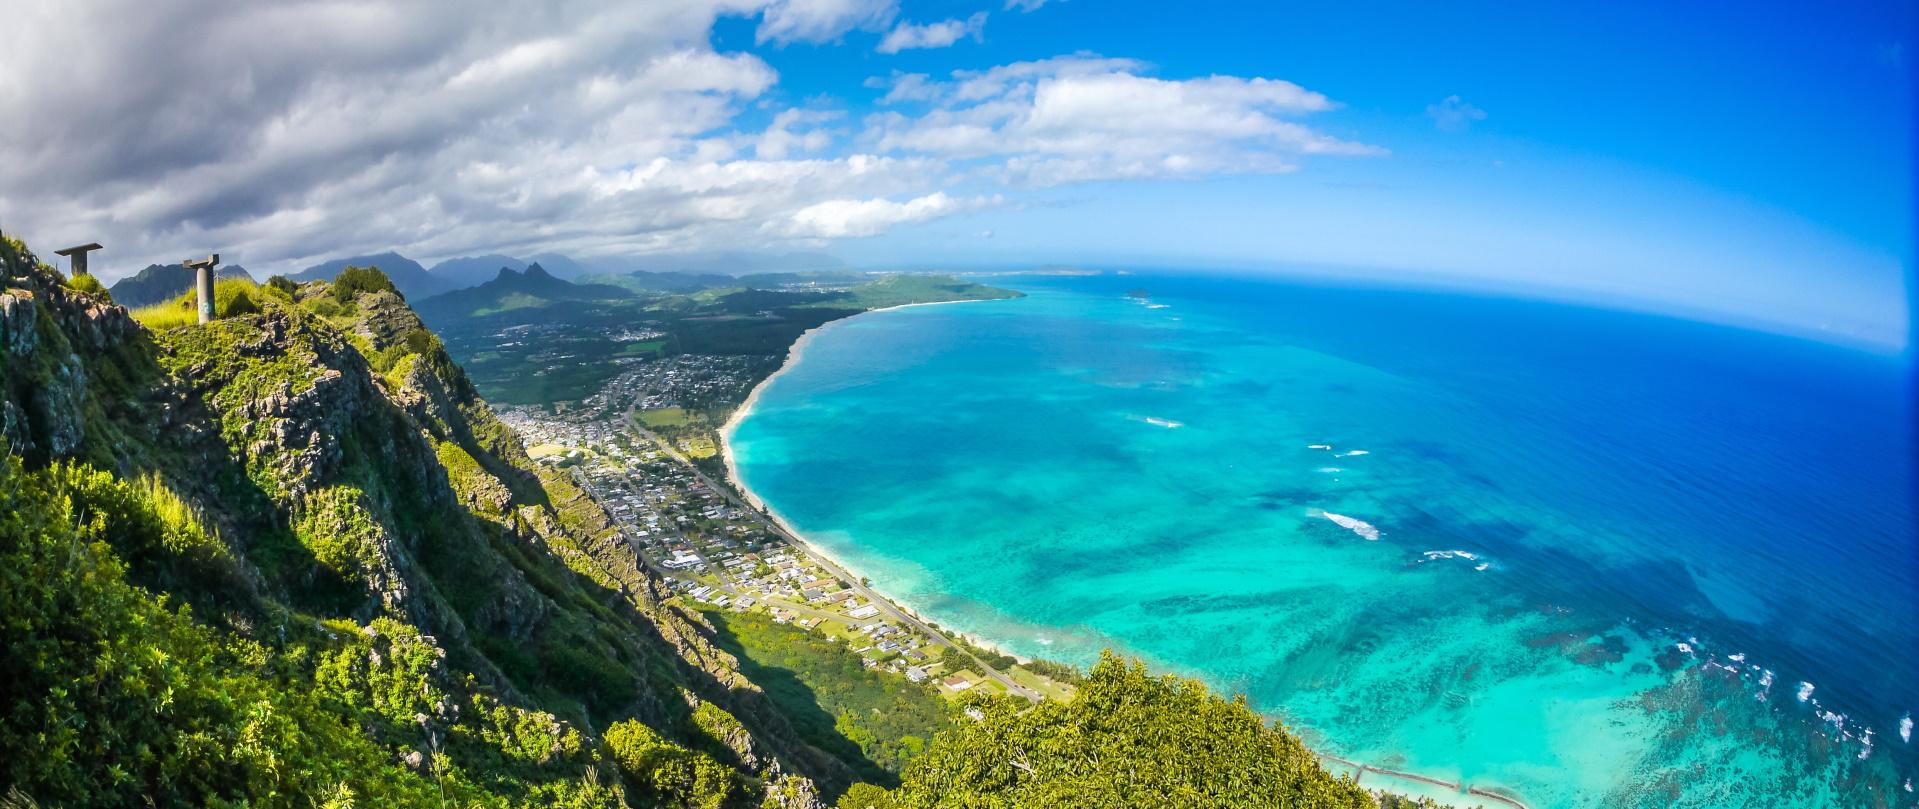 hawaii oahu 8VG3S86